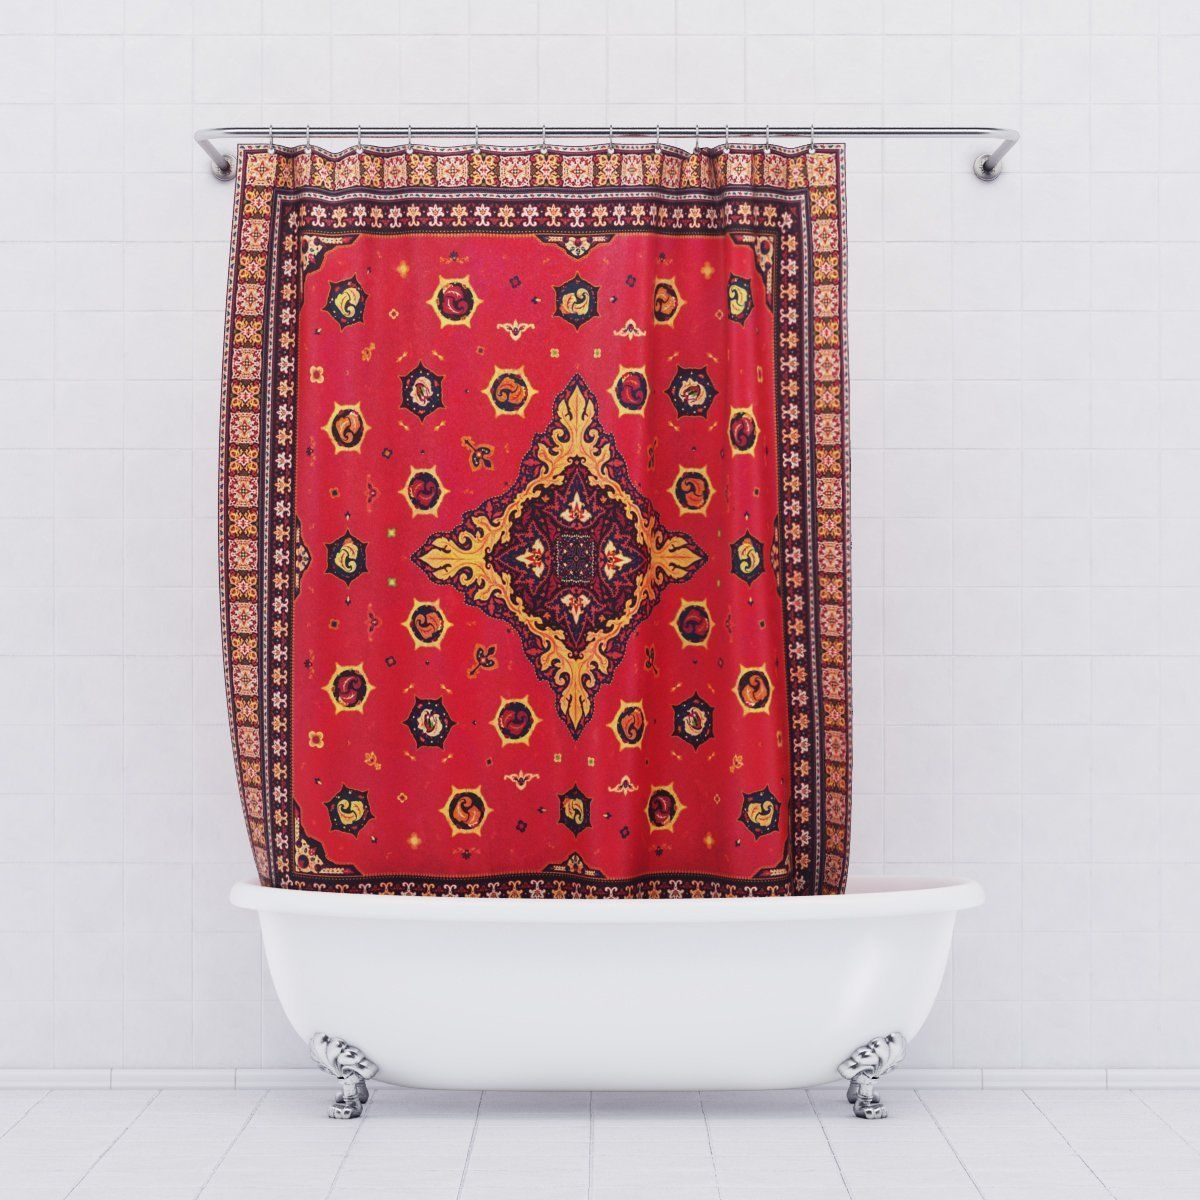 fancy bathroom rugs at walmart model-Cute Bathroom Rugs at Walmart Architecture